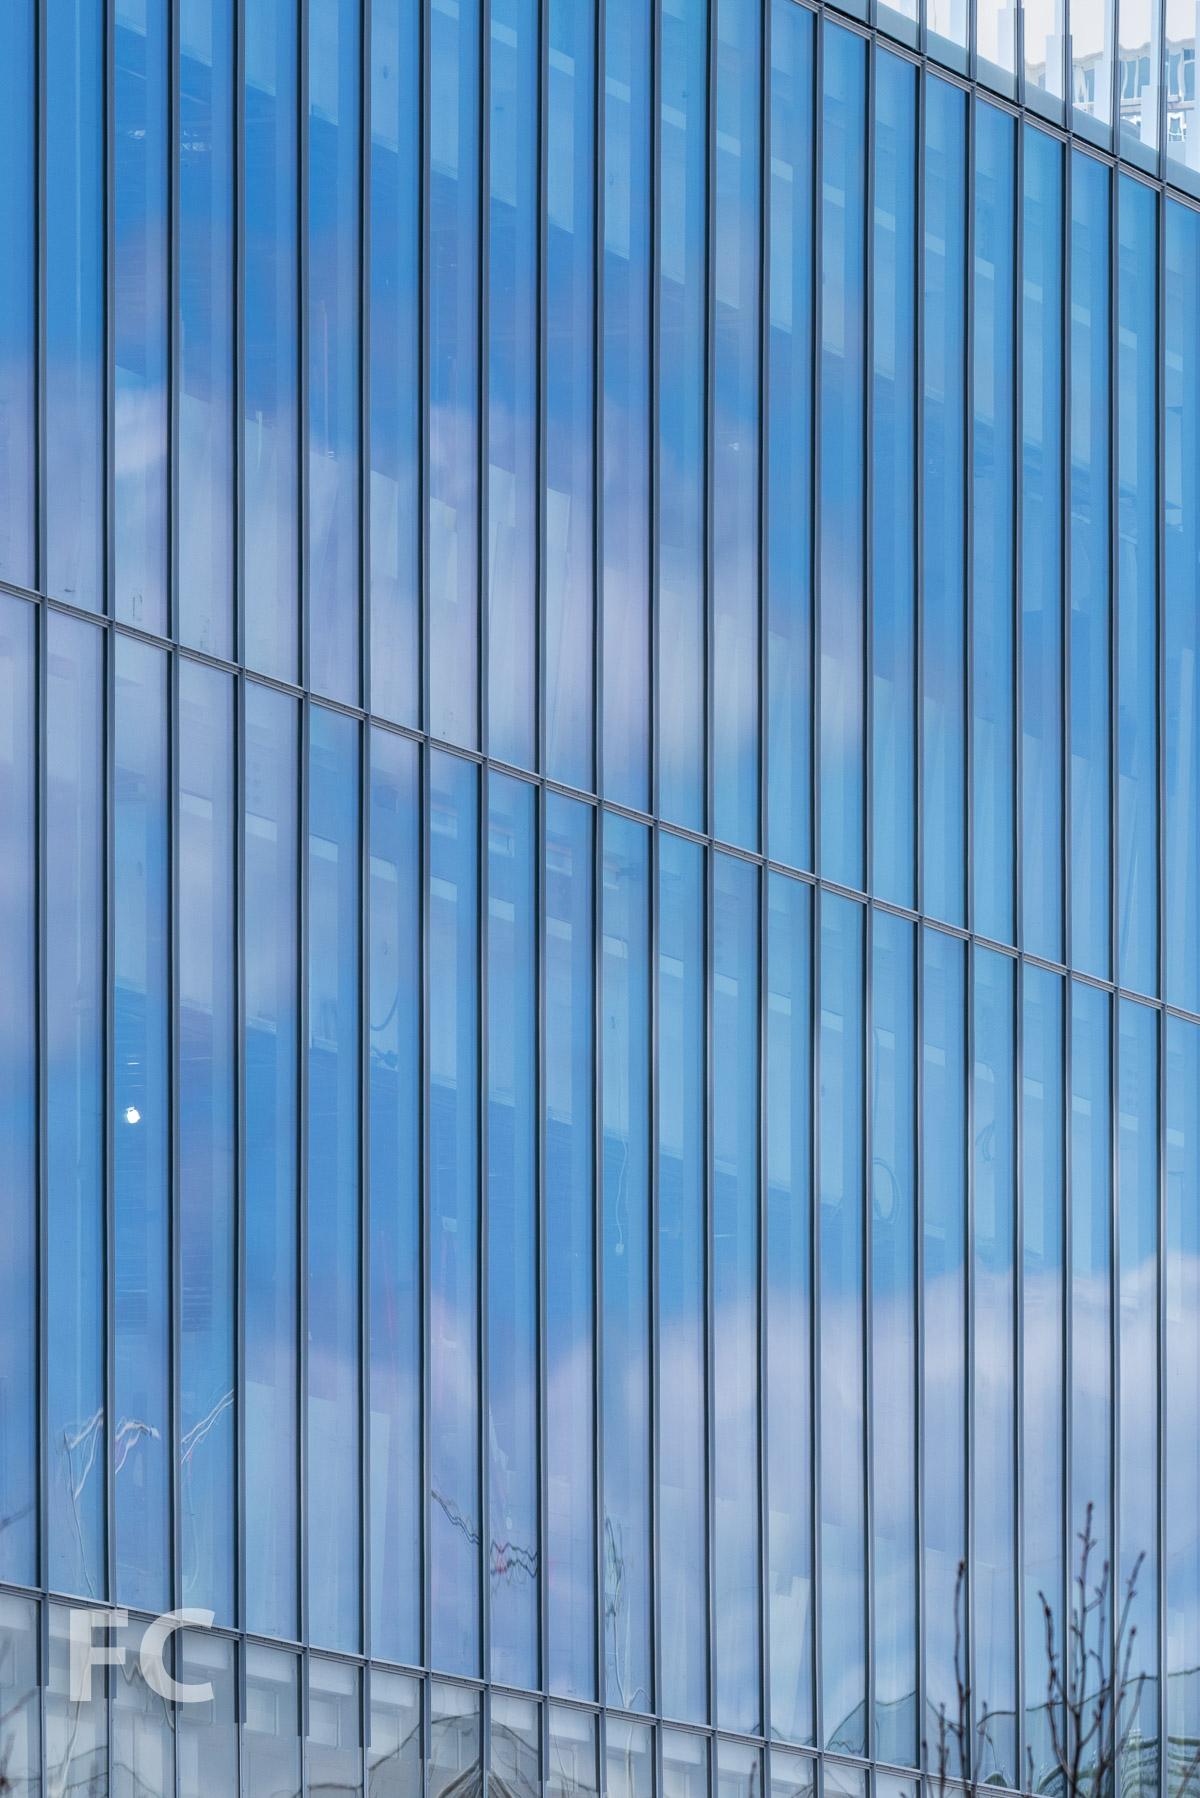 Glass curtain wall facade close-up.